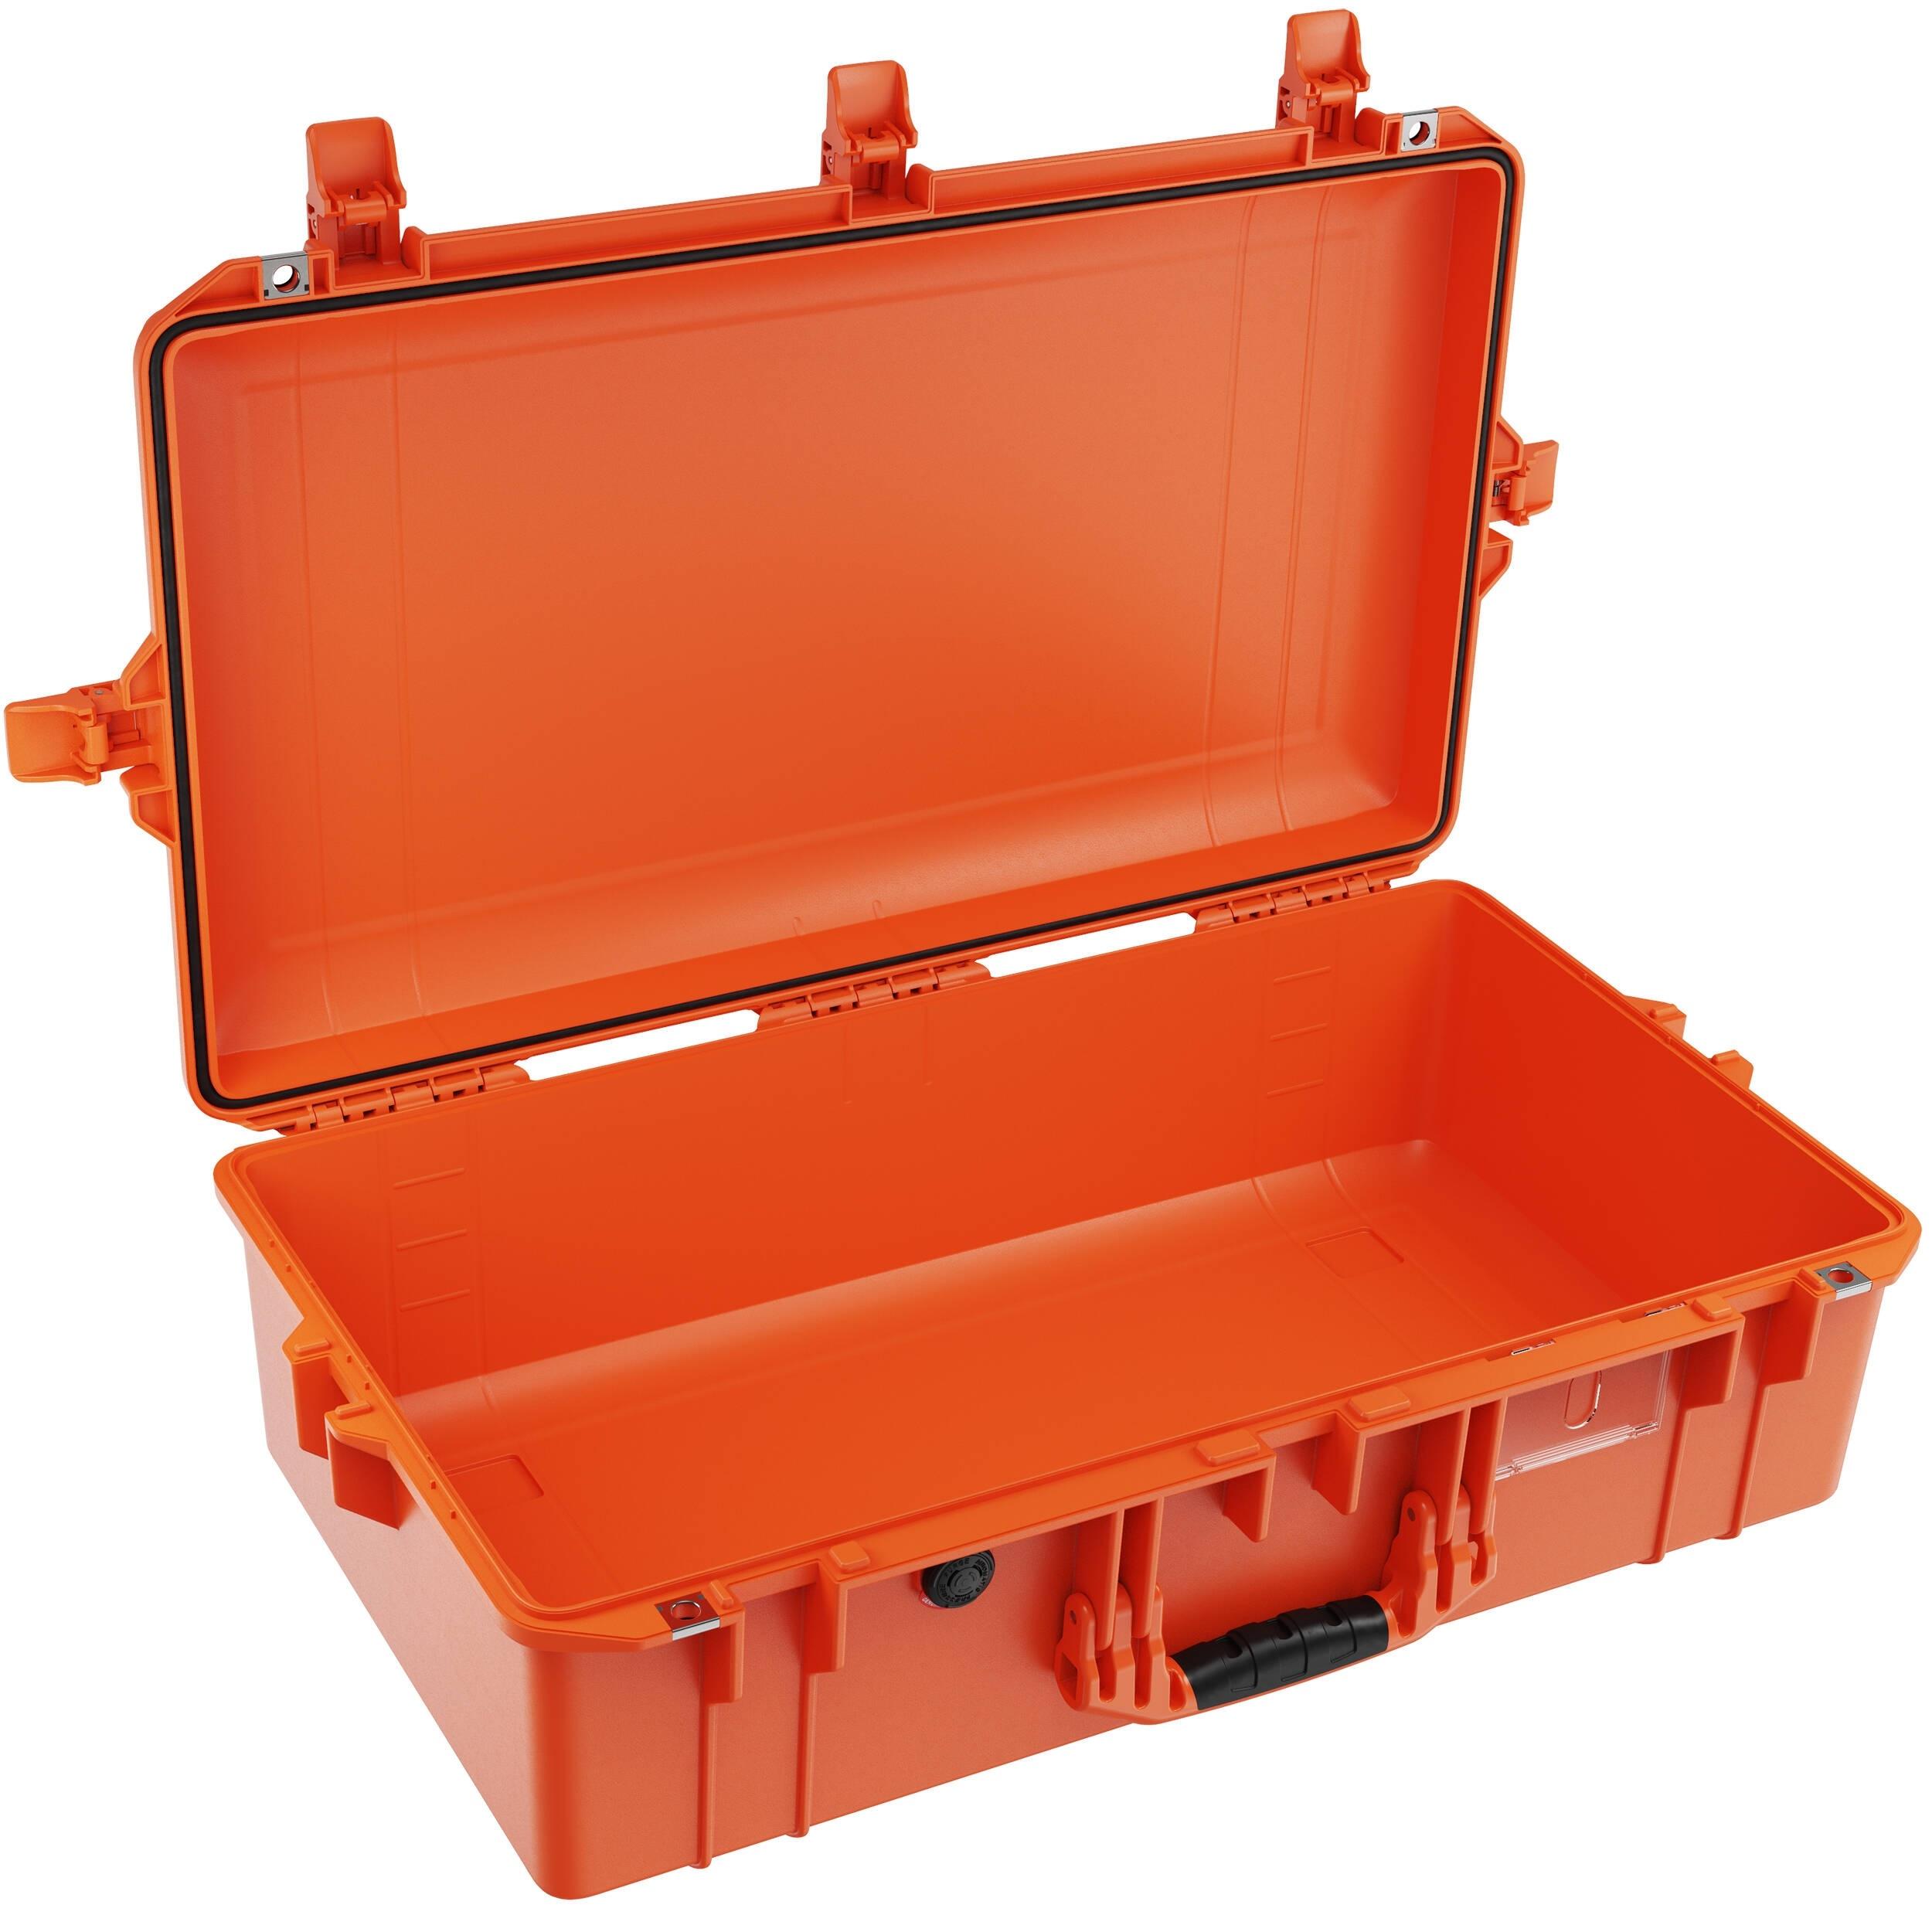 Pelican 1605Air Gen 2 Hard Carry Case with Liner, No Insert (Orange)